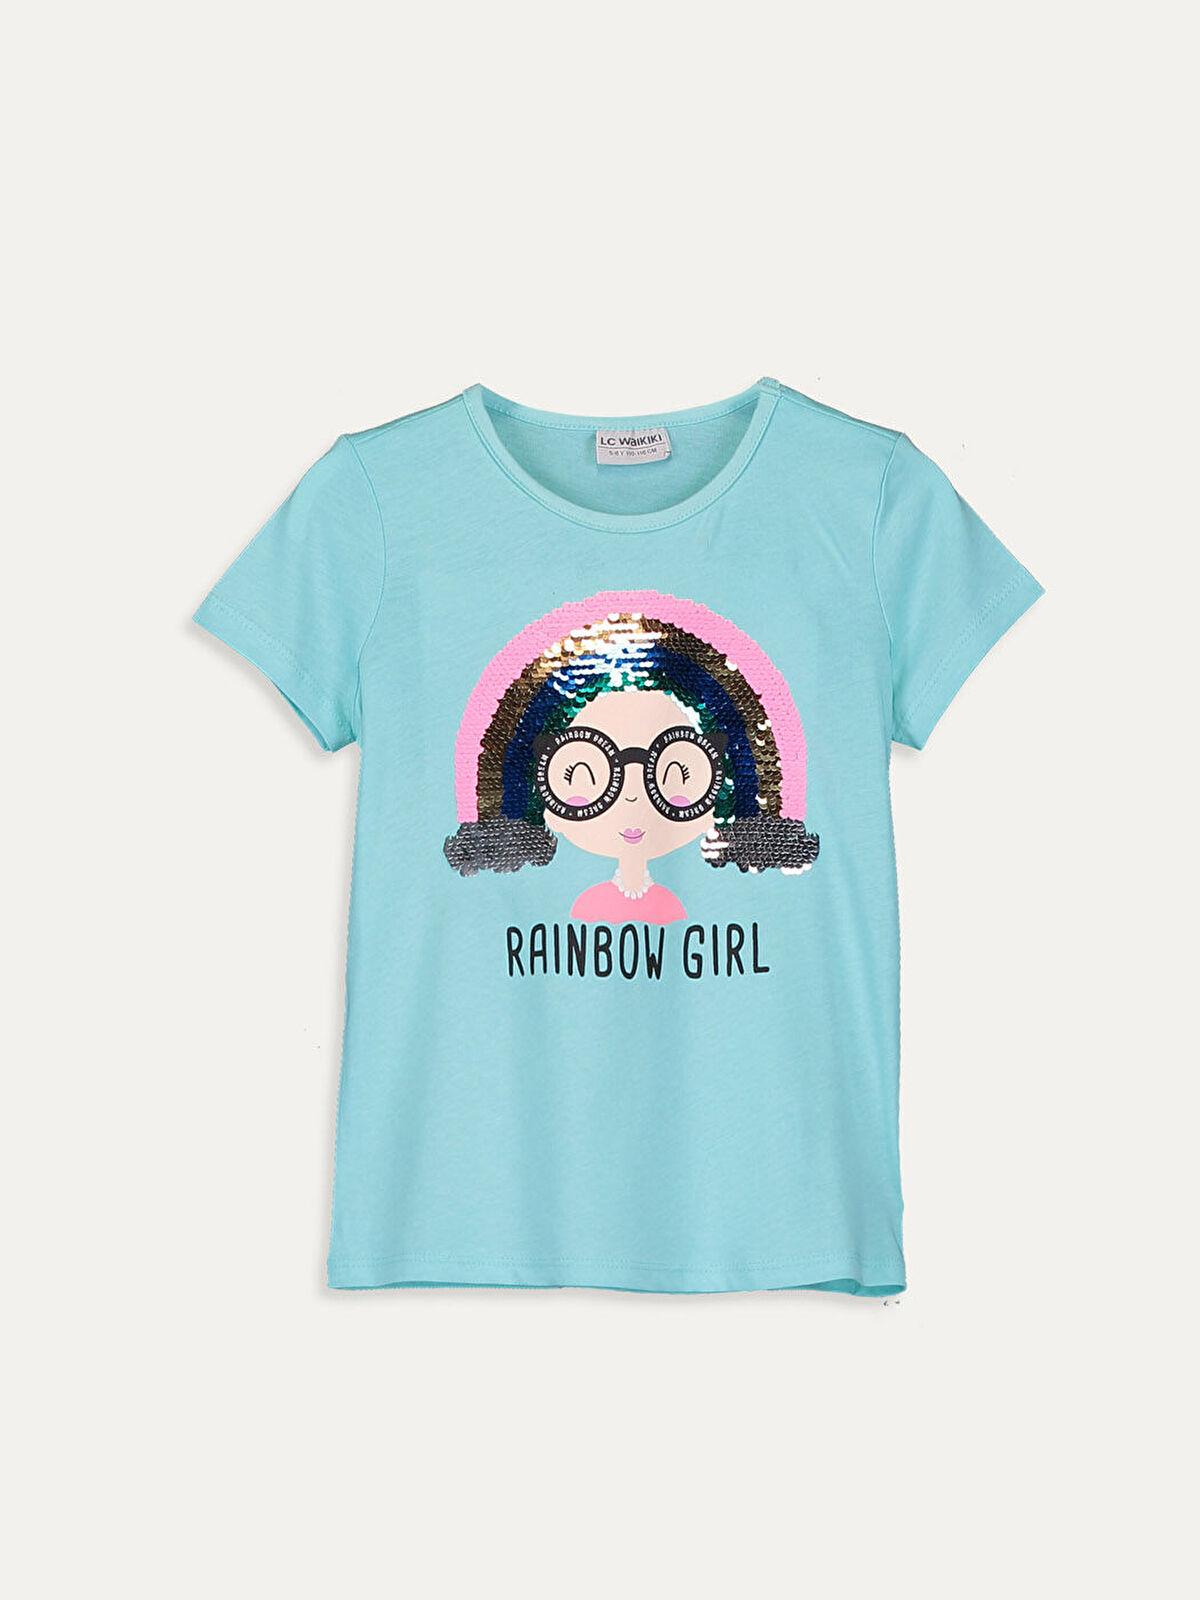 Kız Çocuk Çift Yönlü Payetli Pamuklu Tişört - LC WAIKIKI